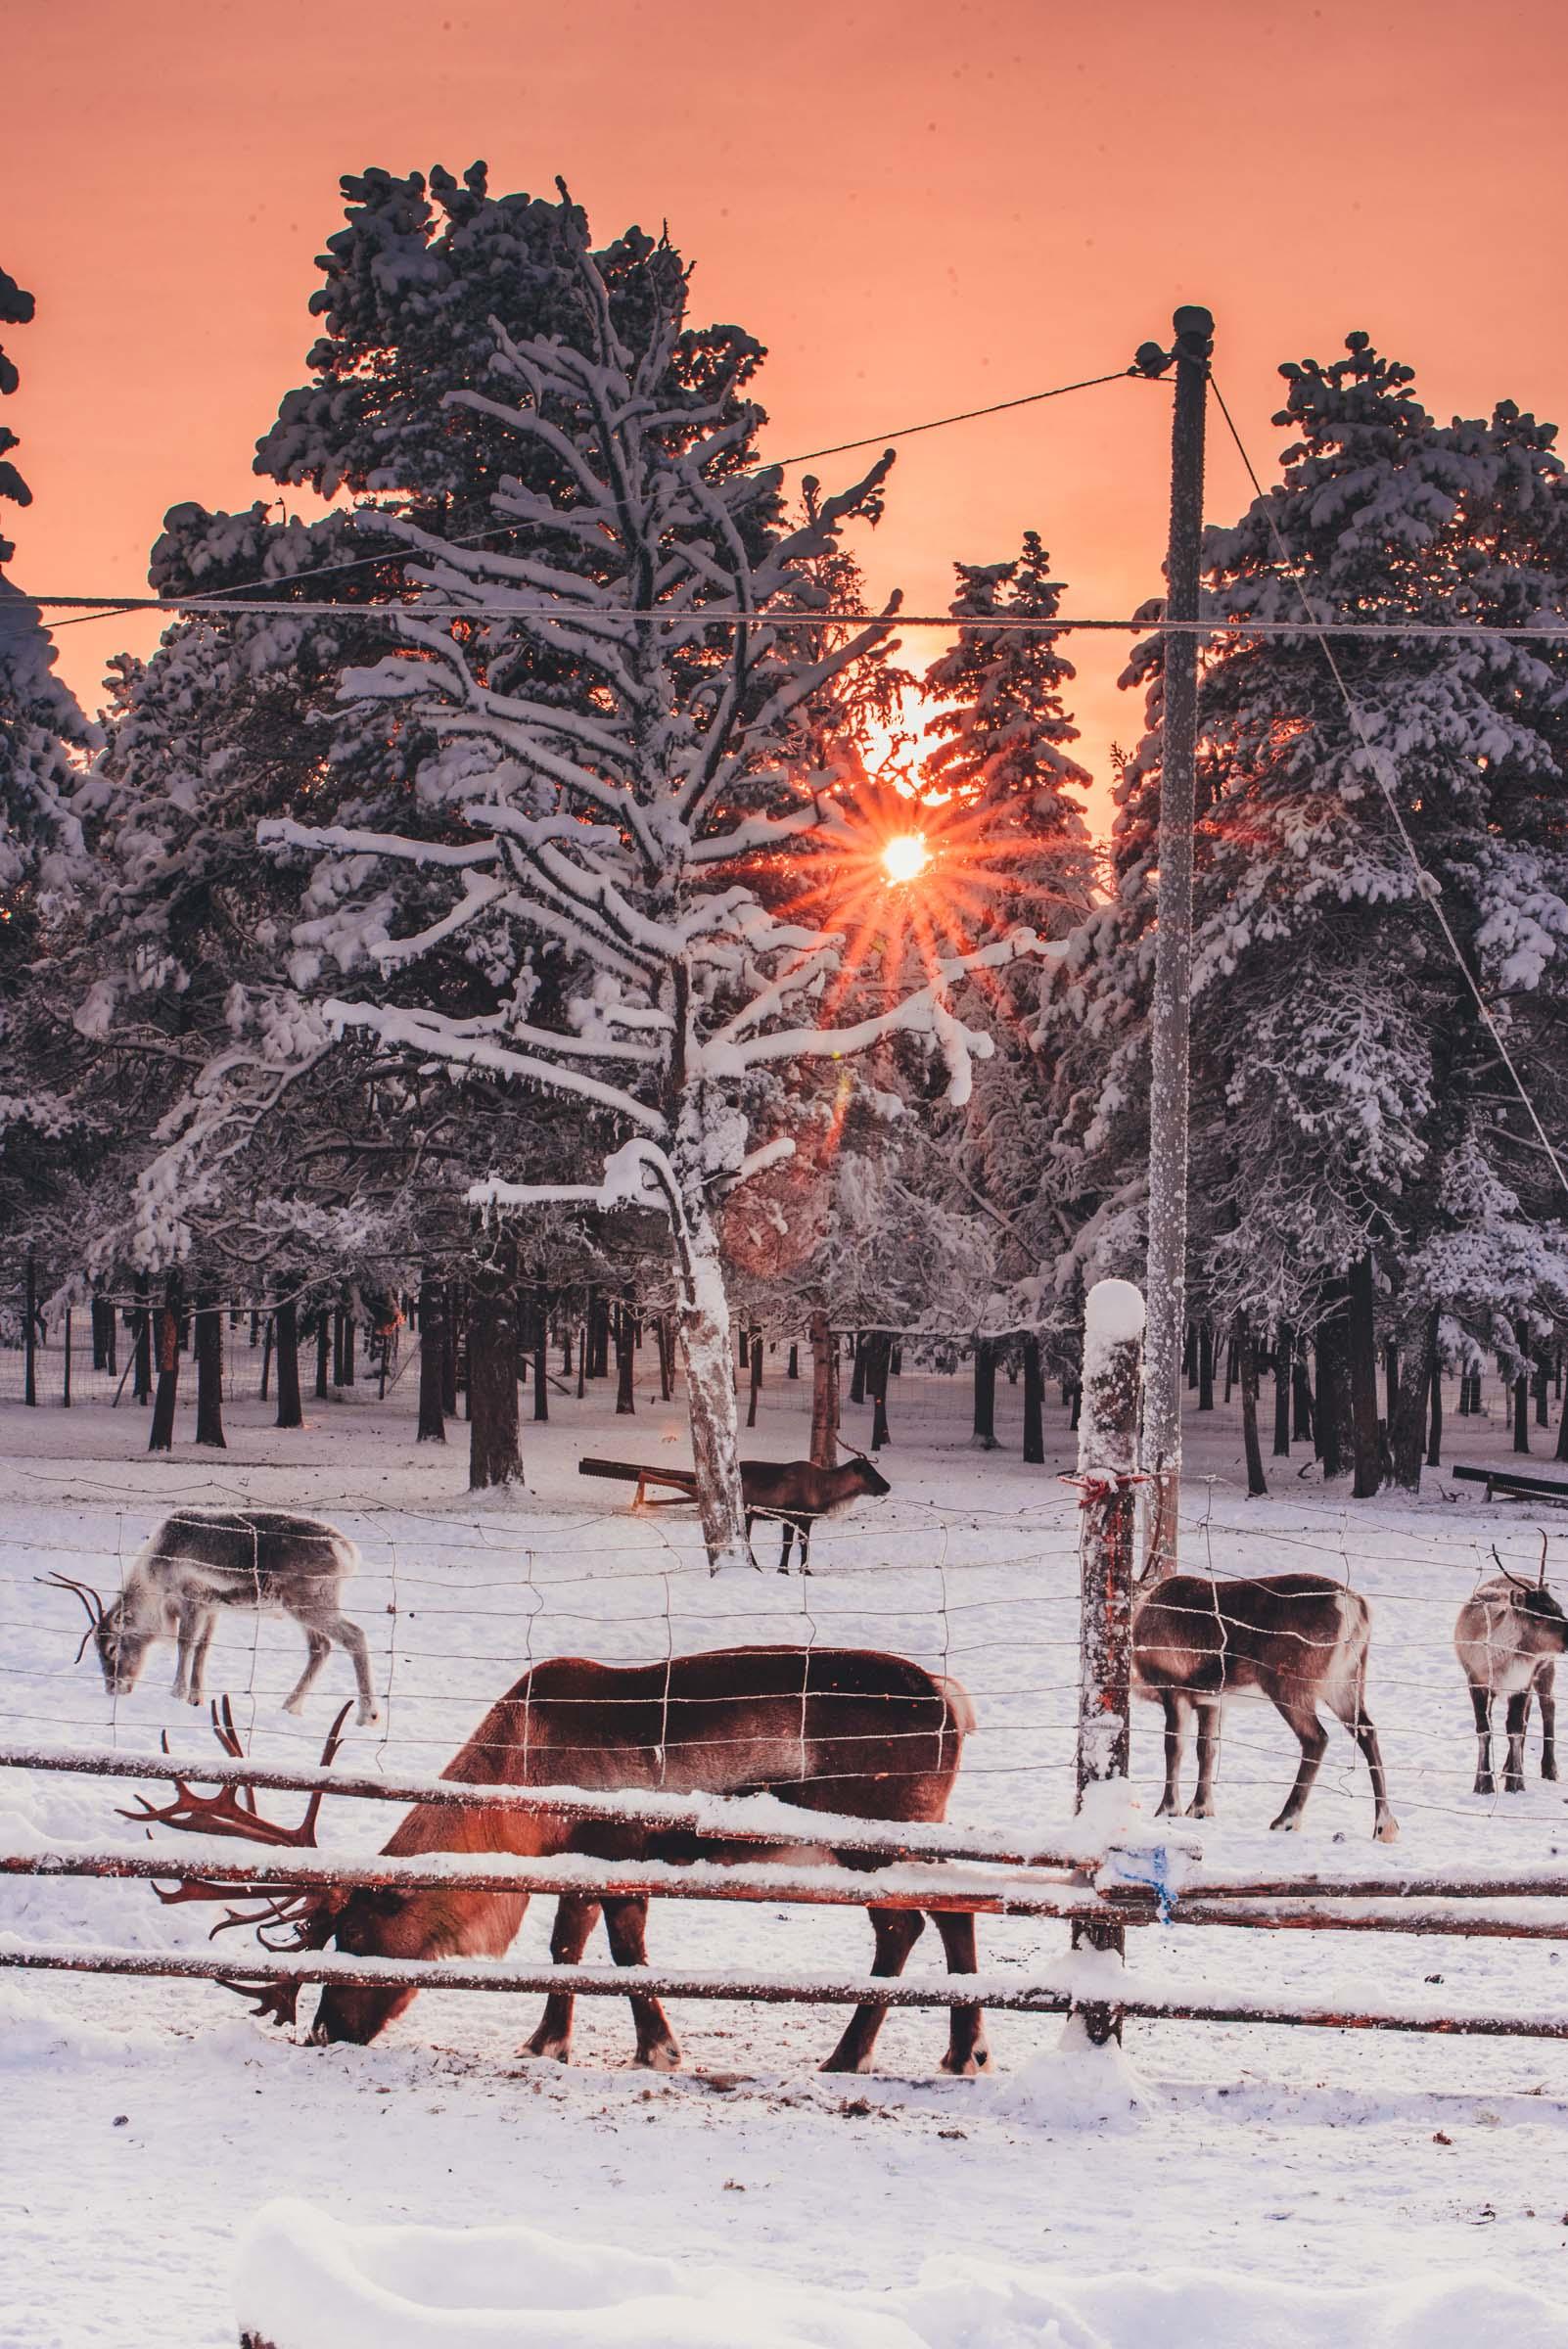 Lapland Reindeer Sleigh Ride